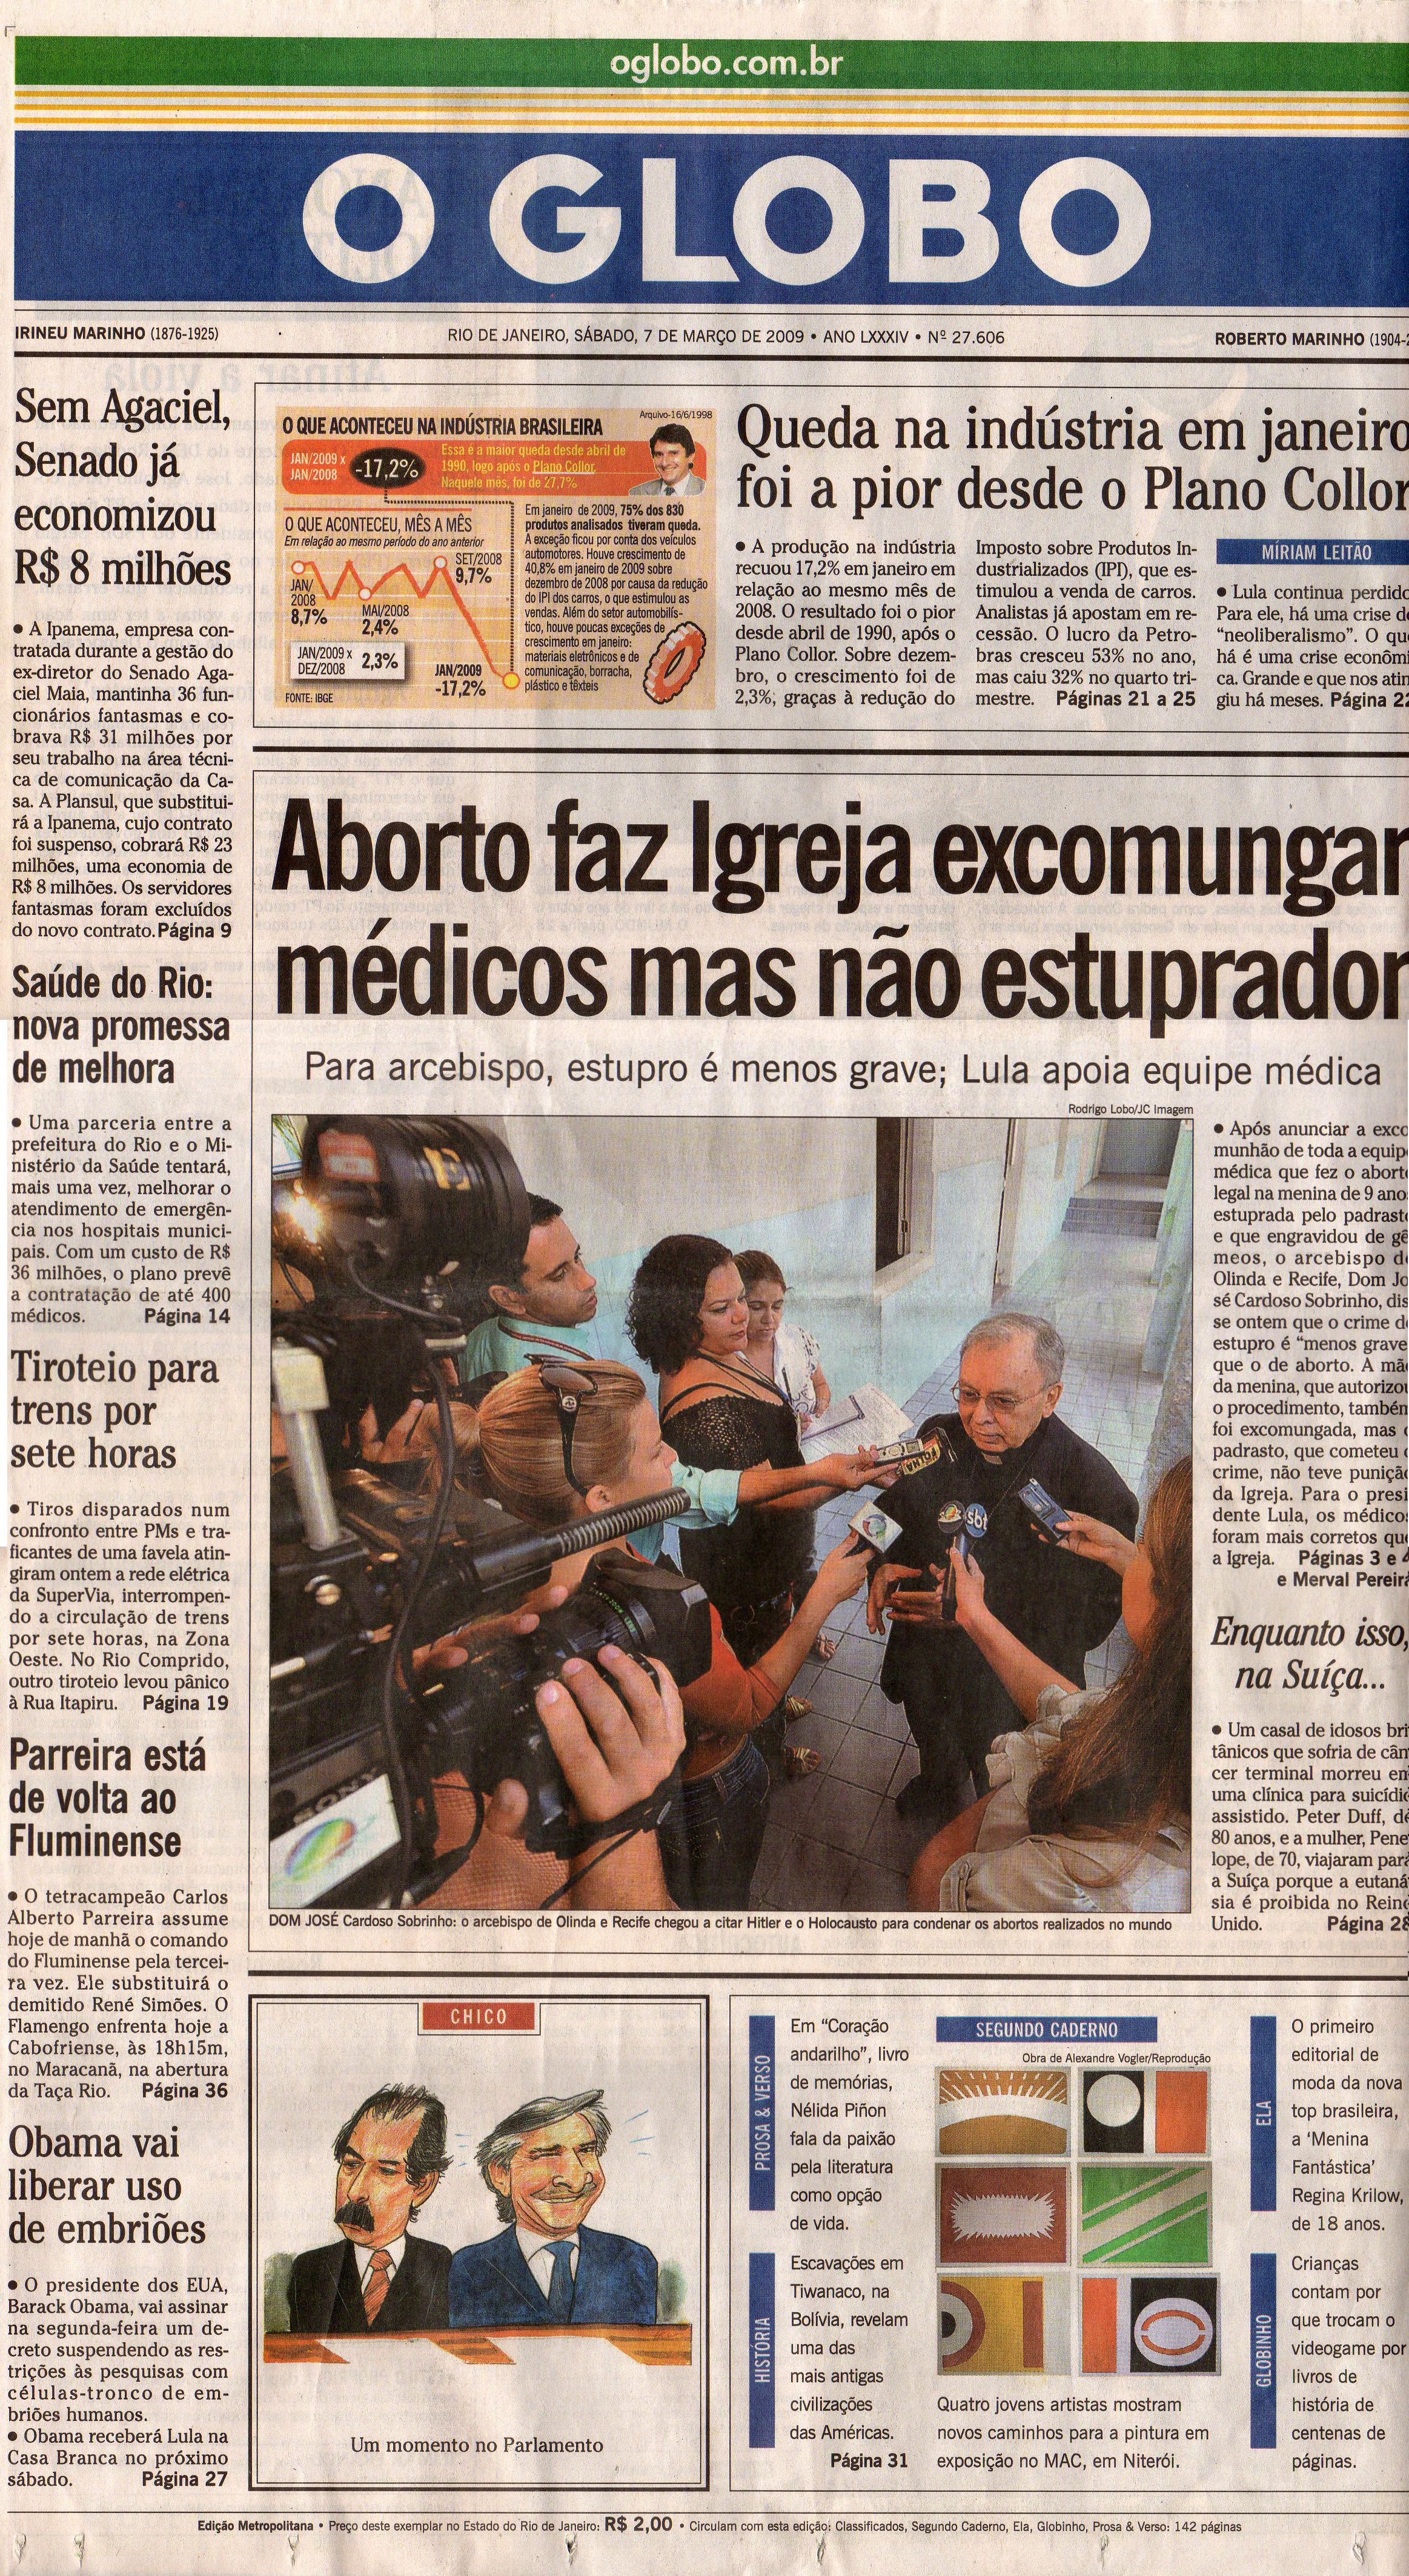 O Triunfo do Projeto Construtivo Brasileiro - O GLOBO 2009